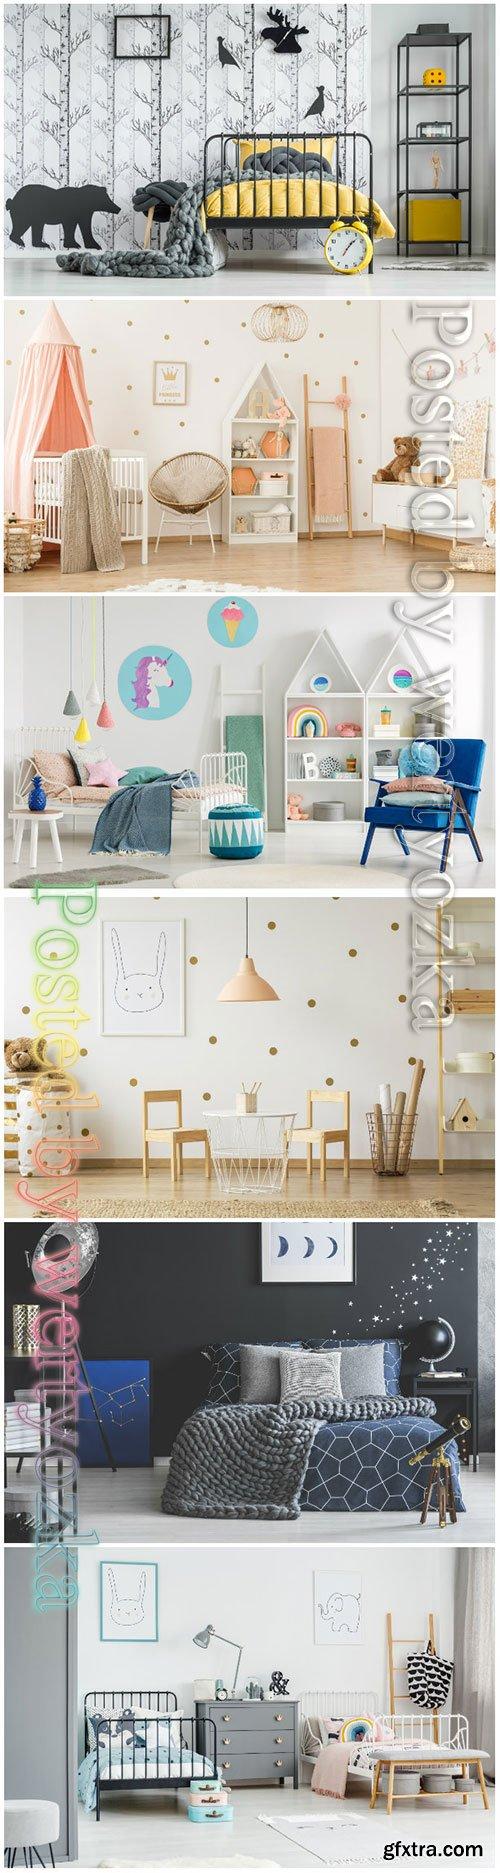 Child's room beautiful stock photo